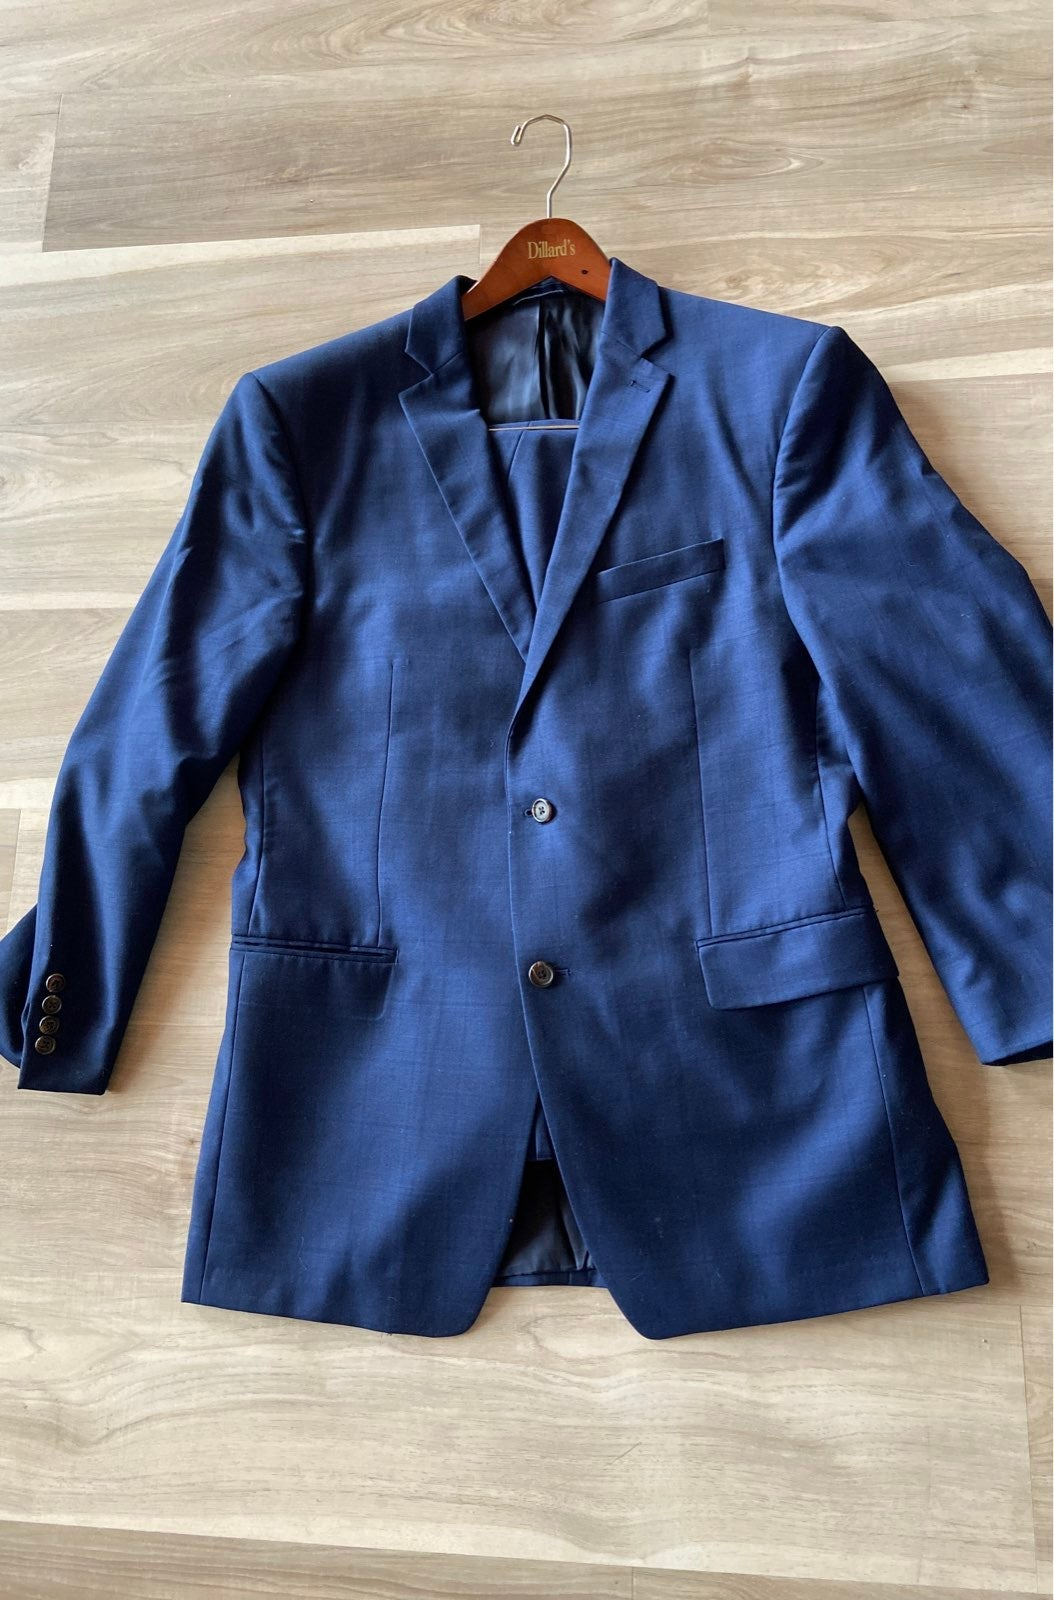 Suit Ralph Lauren 42 pants 36